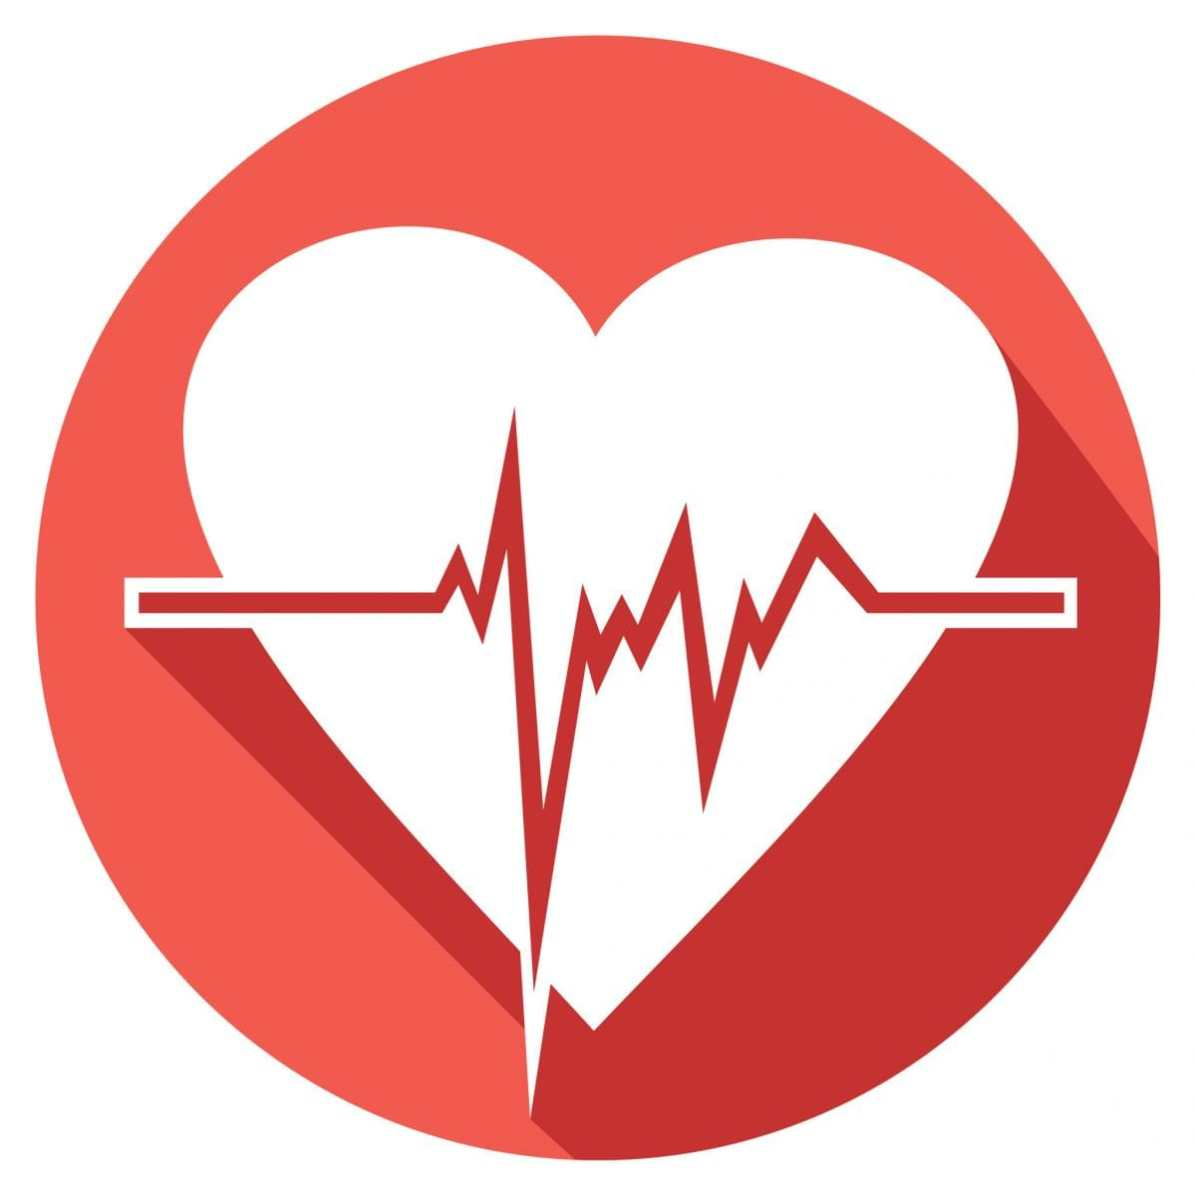 Heart data concept. Copyright: tribalium123 / 123RF Stock Photo